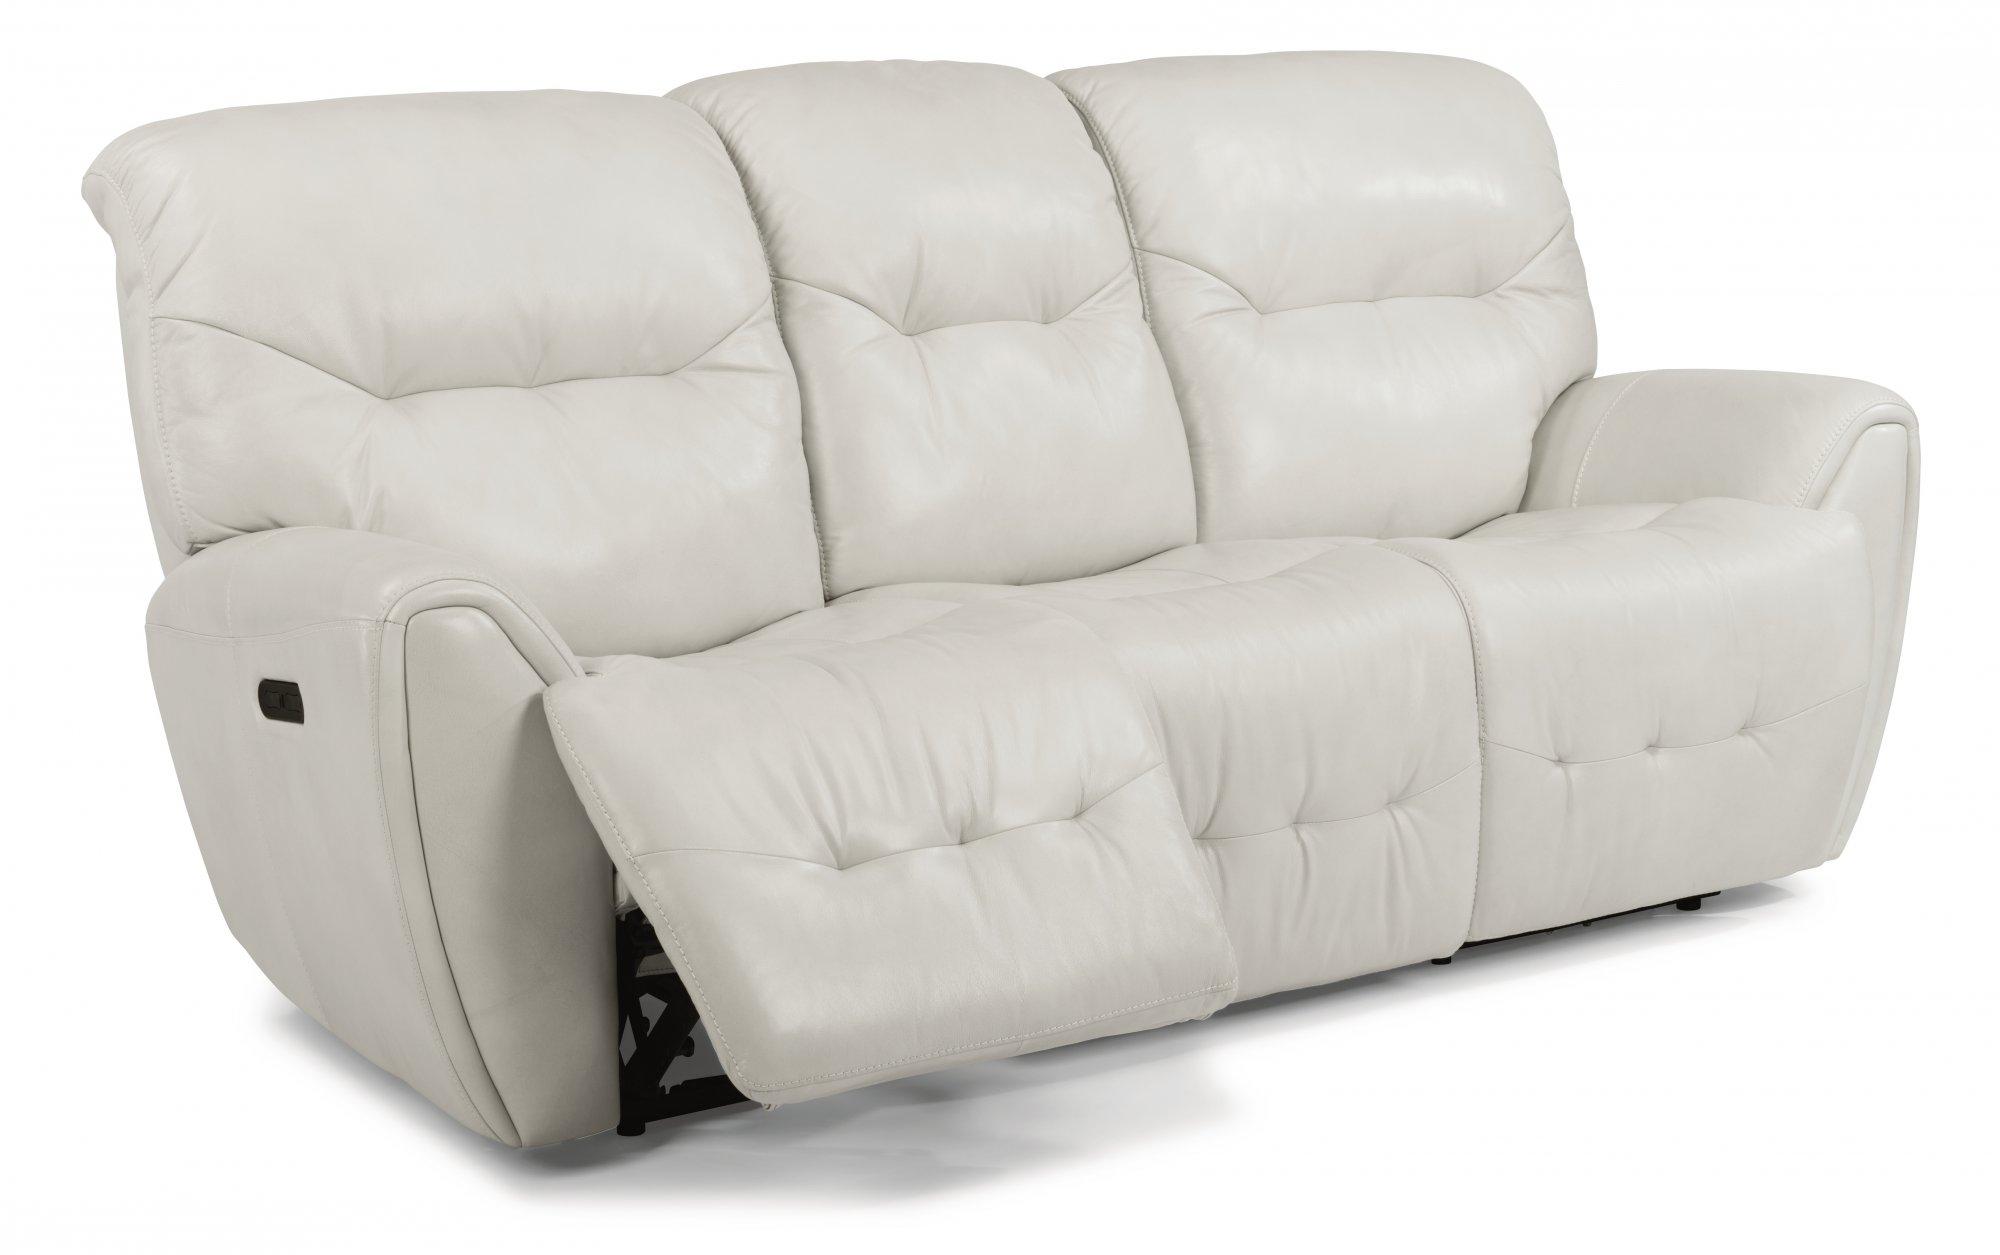 Flexsteel Blaise  Leather Power Reclining Sofa with Power Headrests